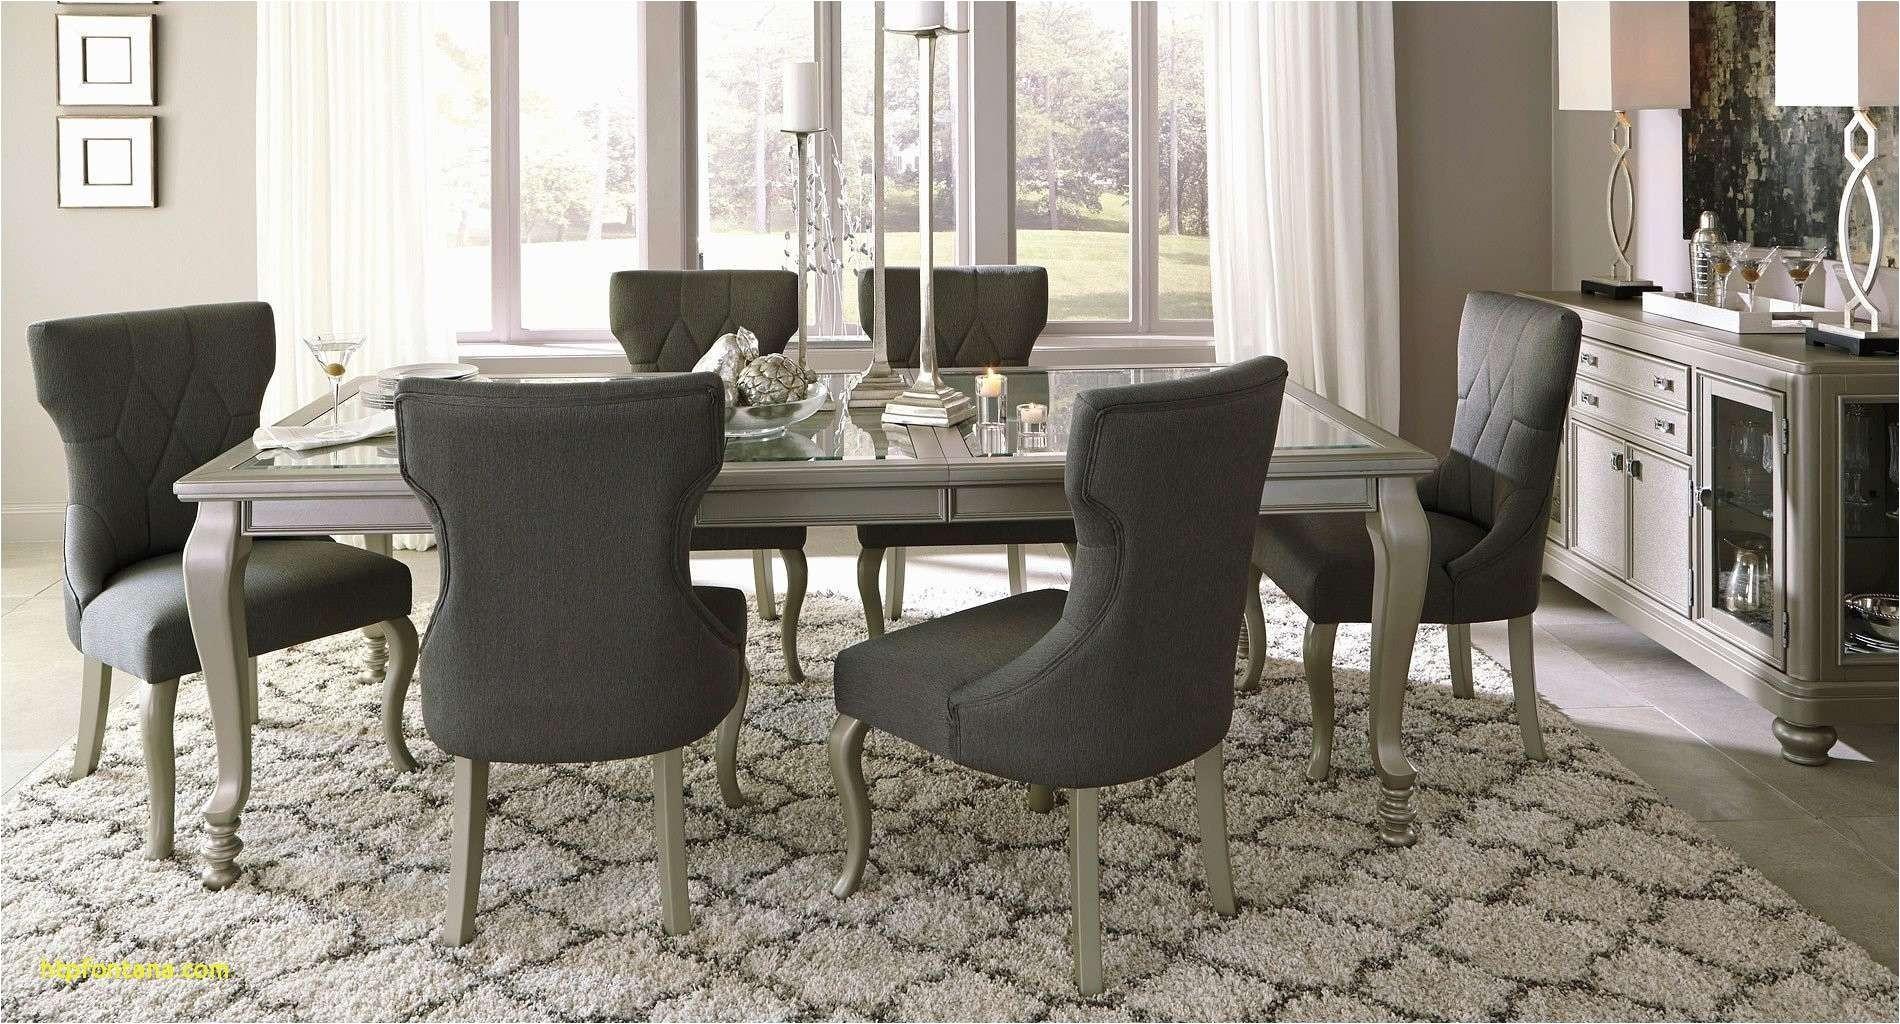 Bedroom Table Design New Lovely Modern Living Room And Kitchen Design Fresh Shaker Chairs 0d